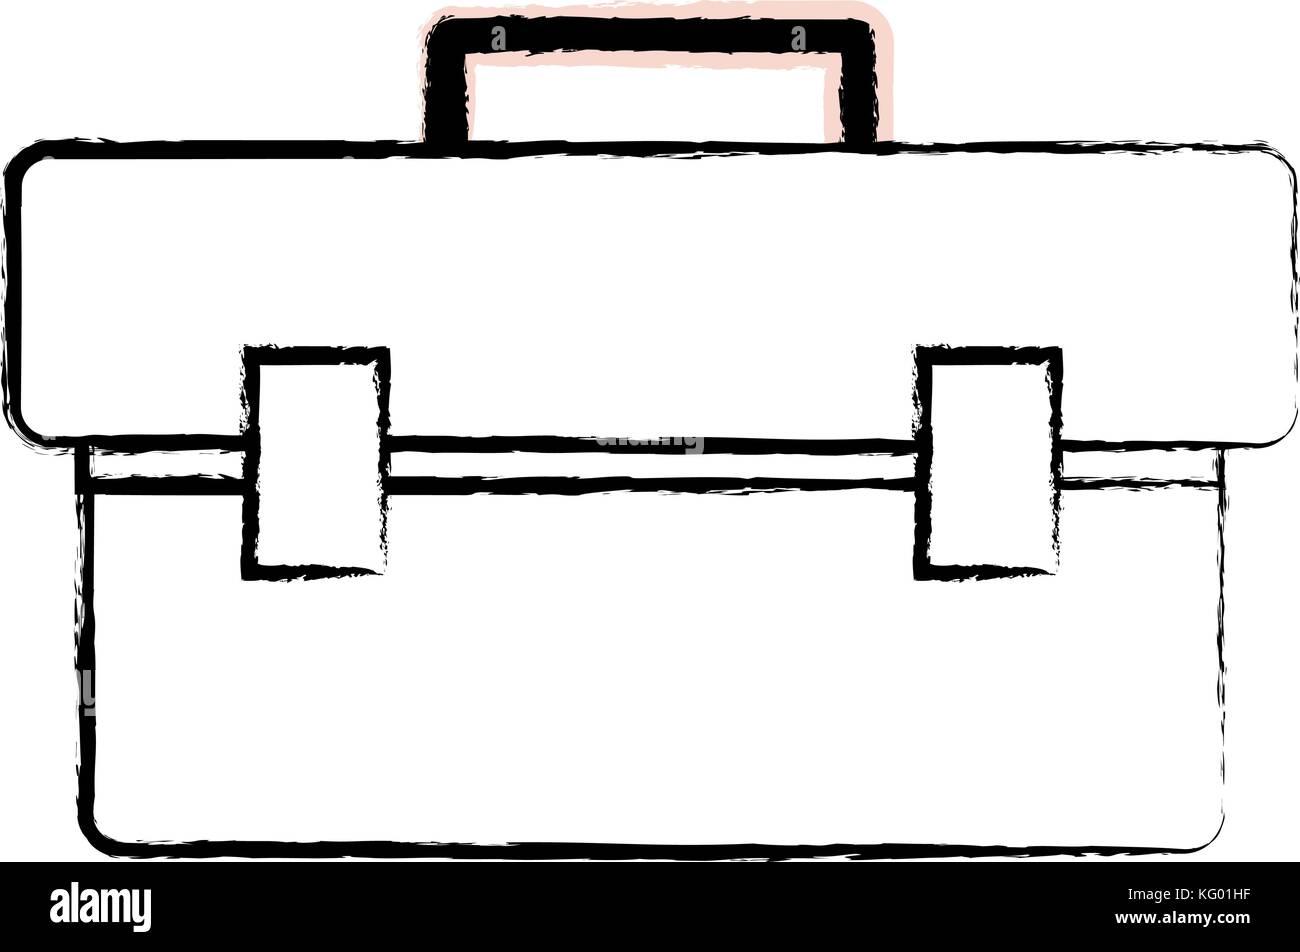 figure box tool equipment to repair construction - Stock Vector